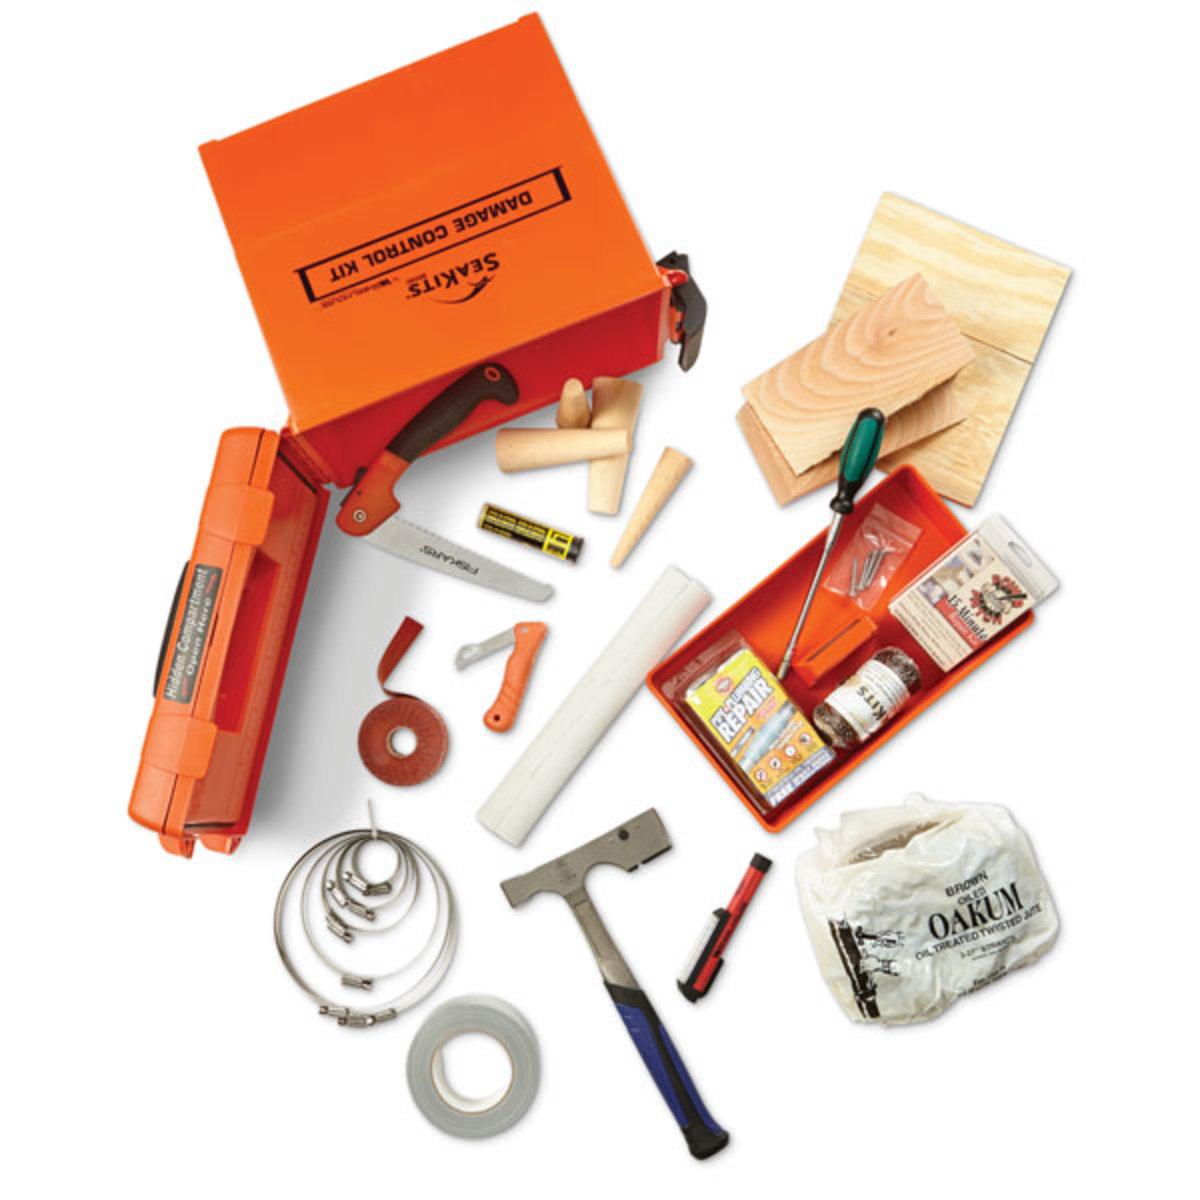 Damage Control Kit from Wheelhouse Technologies